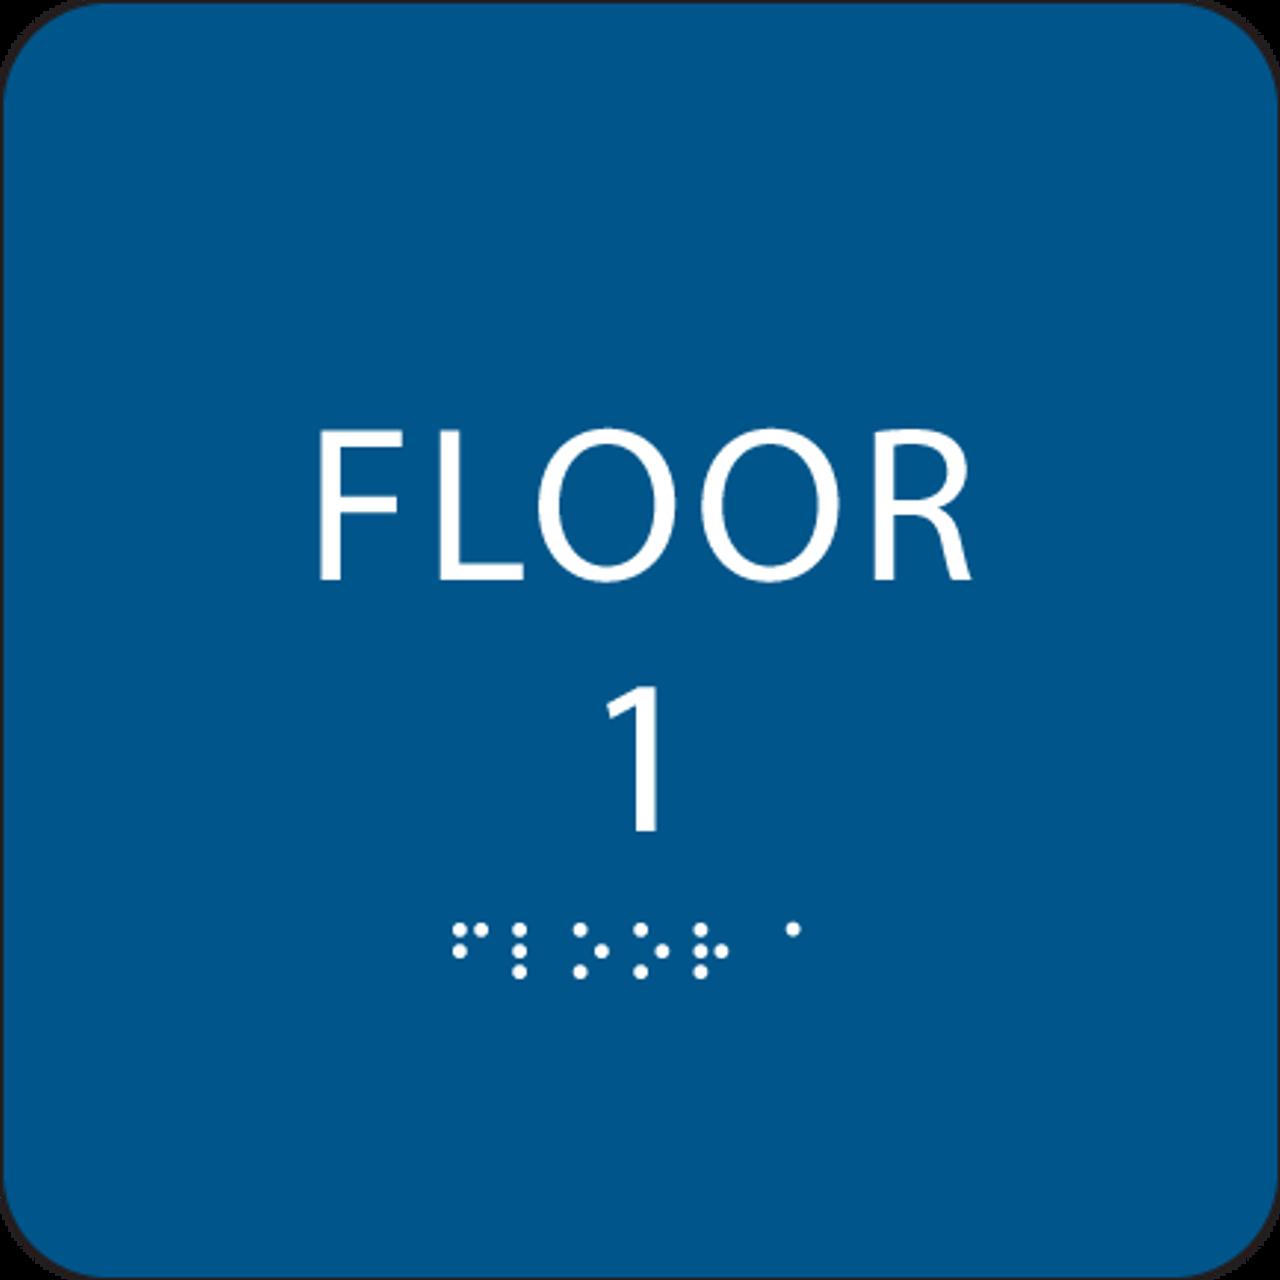 Blue Floor 1 Identification Sign